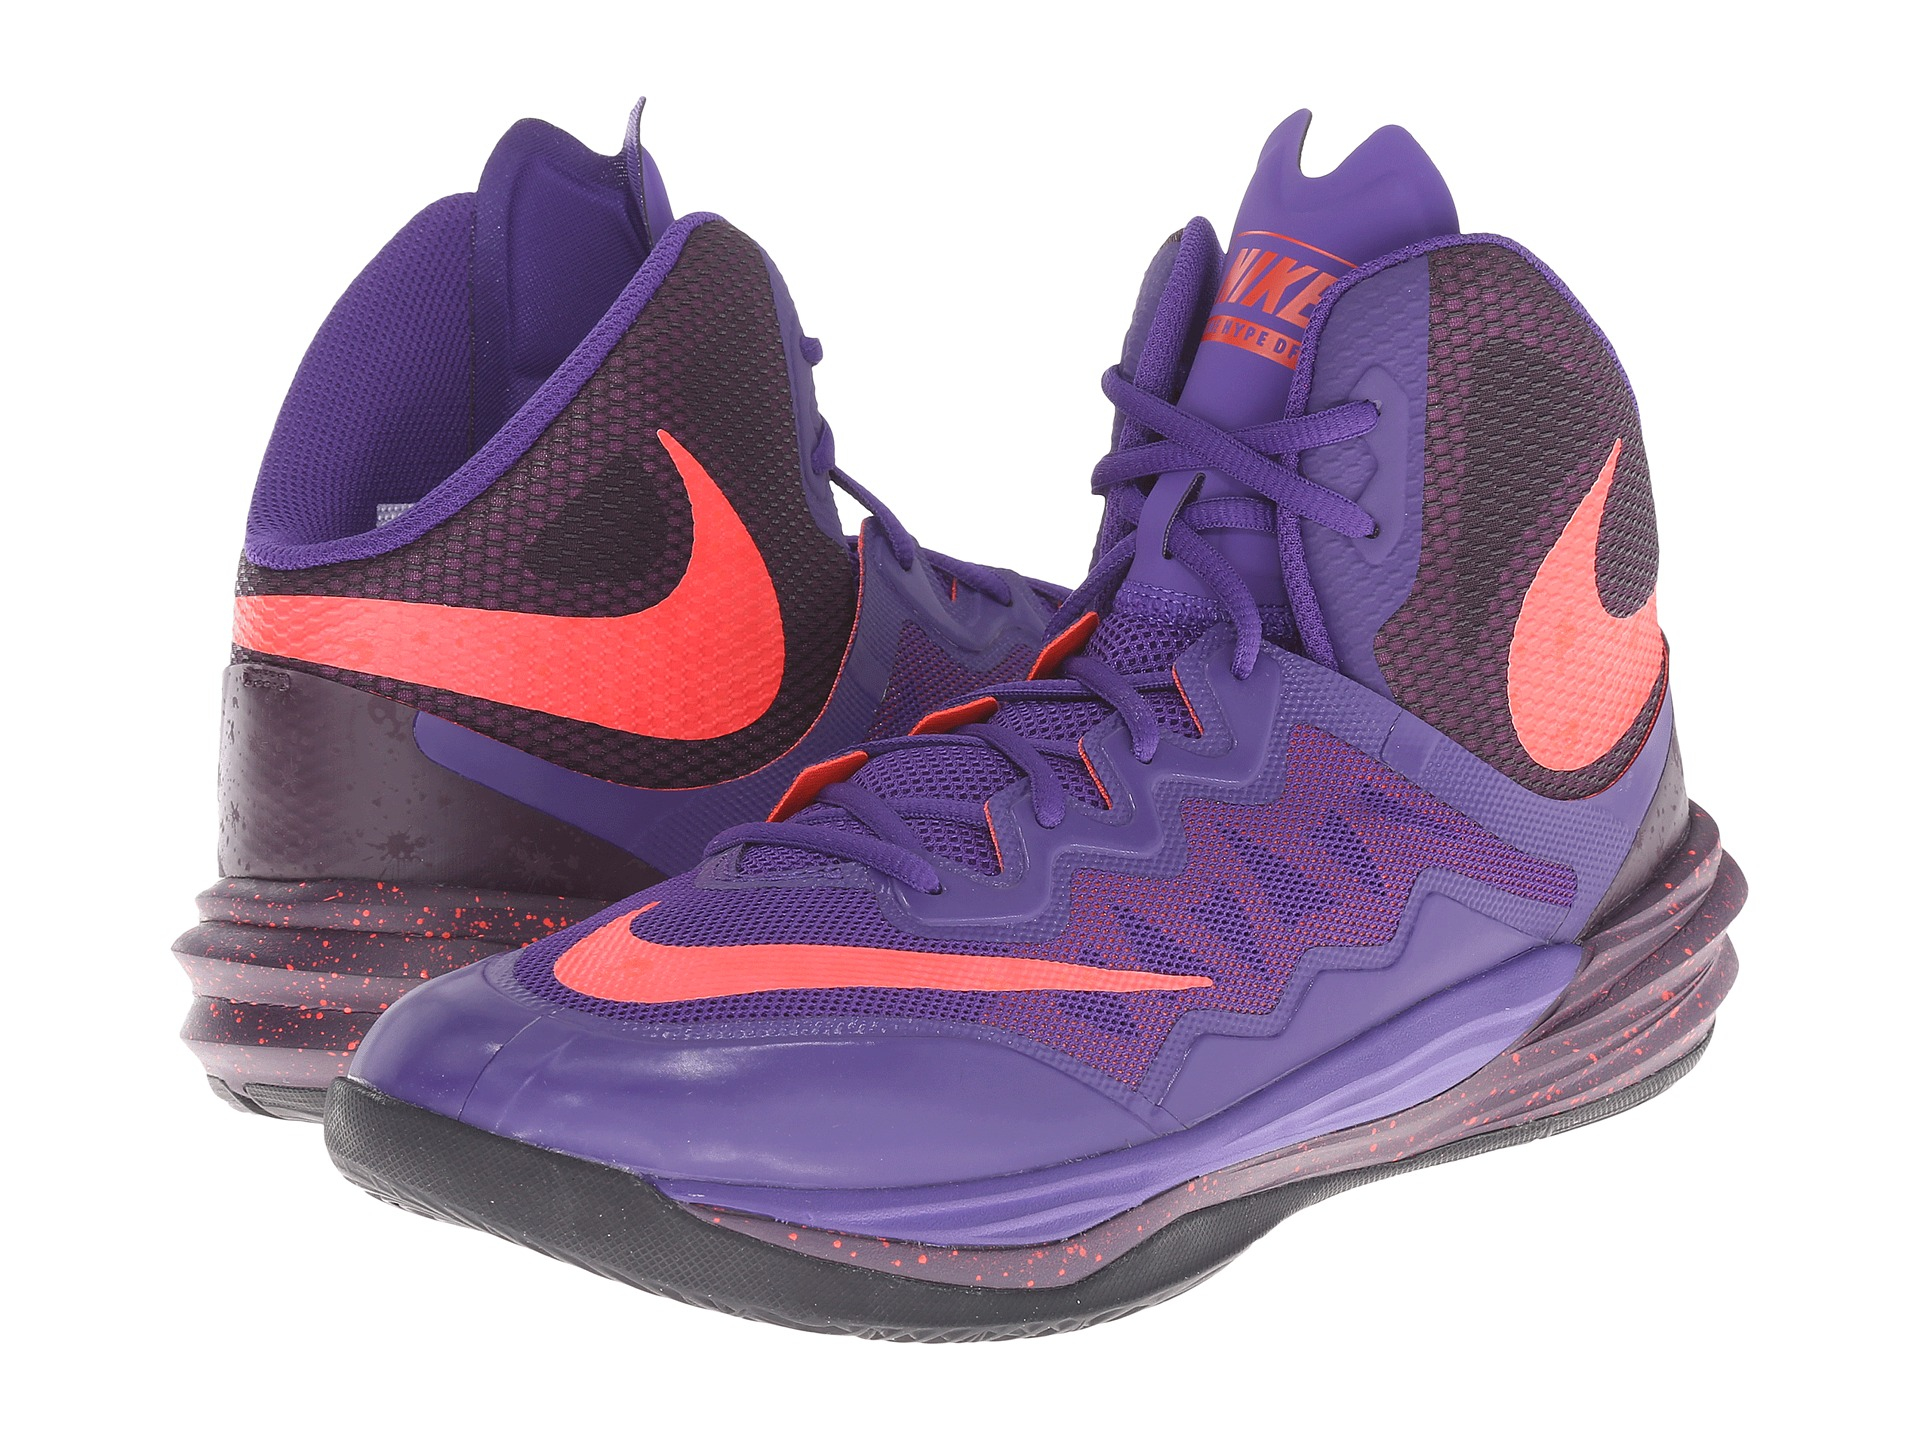 best website bd68d c7480 nike-court-purplenoble-purpleblack-prime-hype-df-ii -purple-product-0-358409613-normal.jpeg